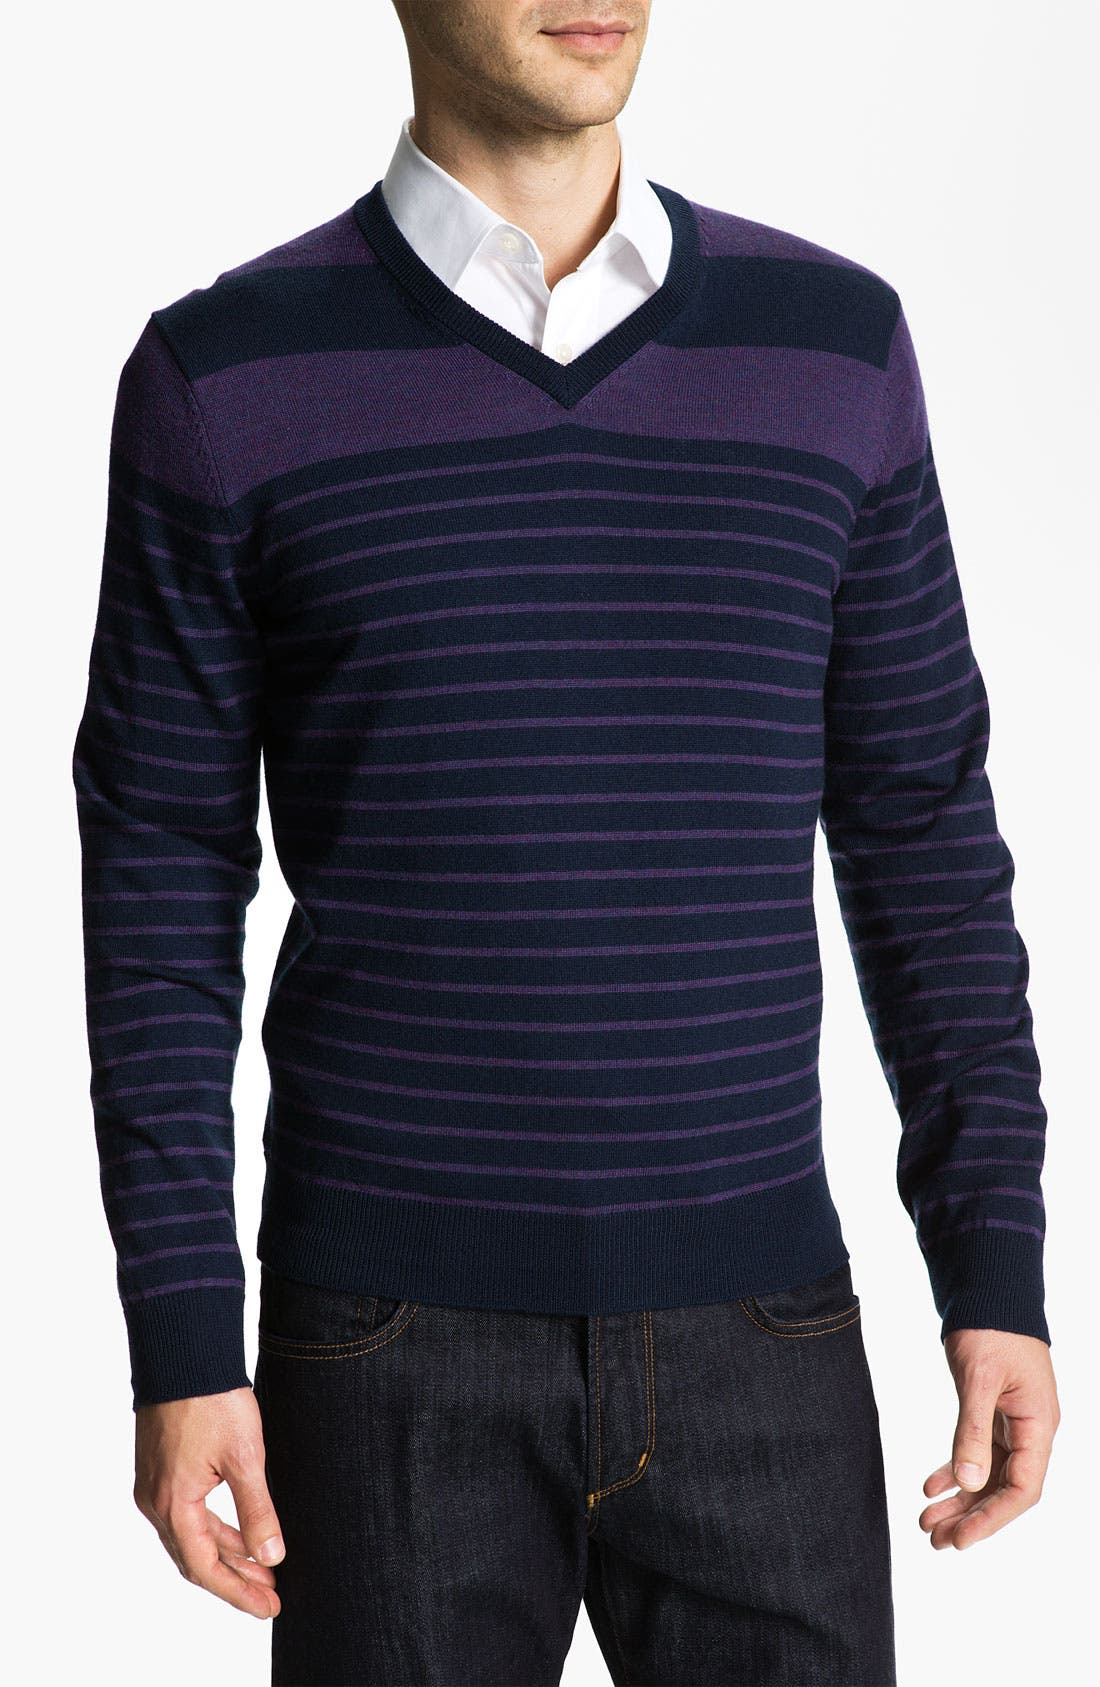 Alternate Image 1 Selected - Cullen89 Merino Wool V-Neck Sweater